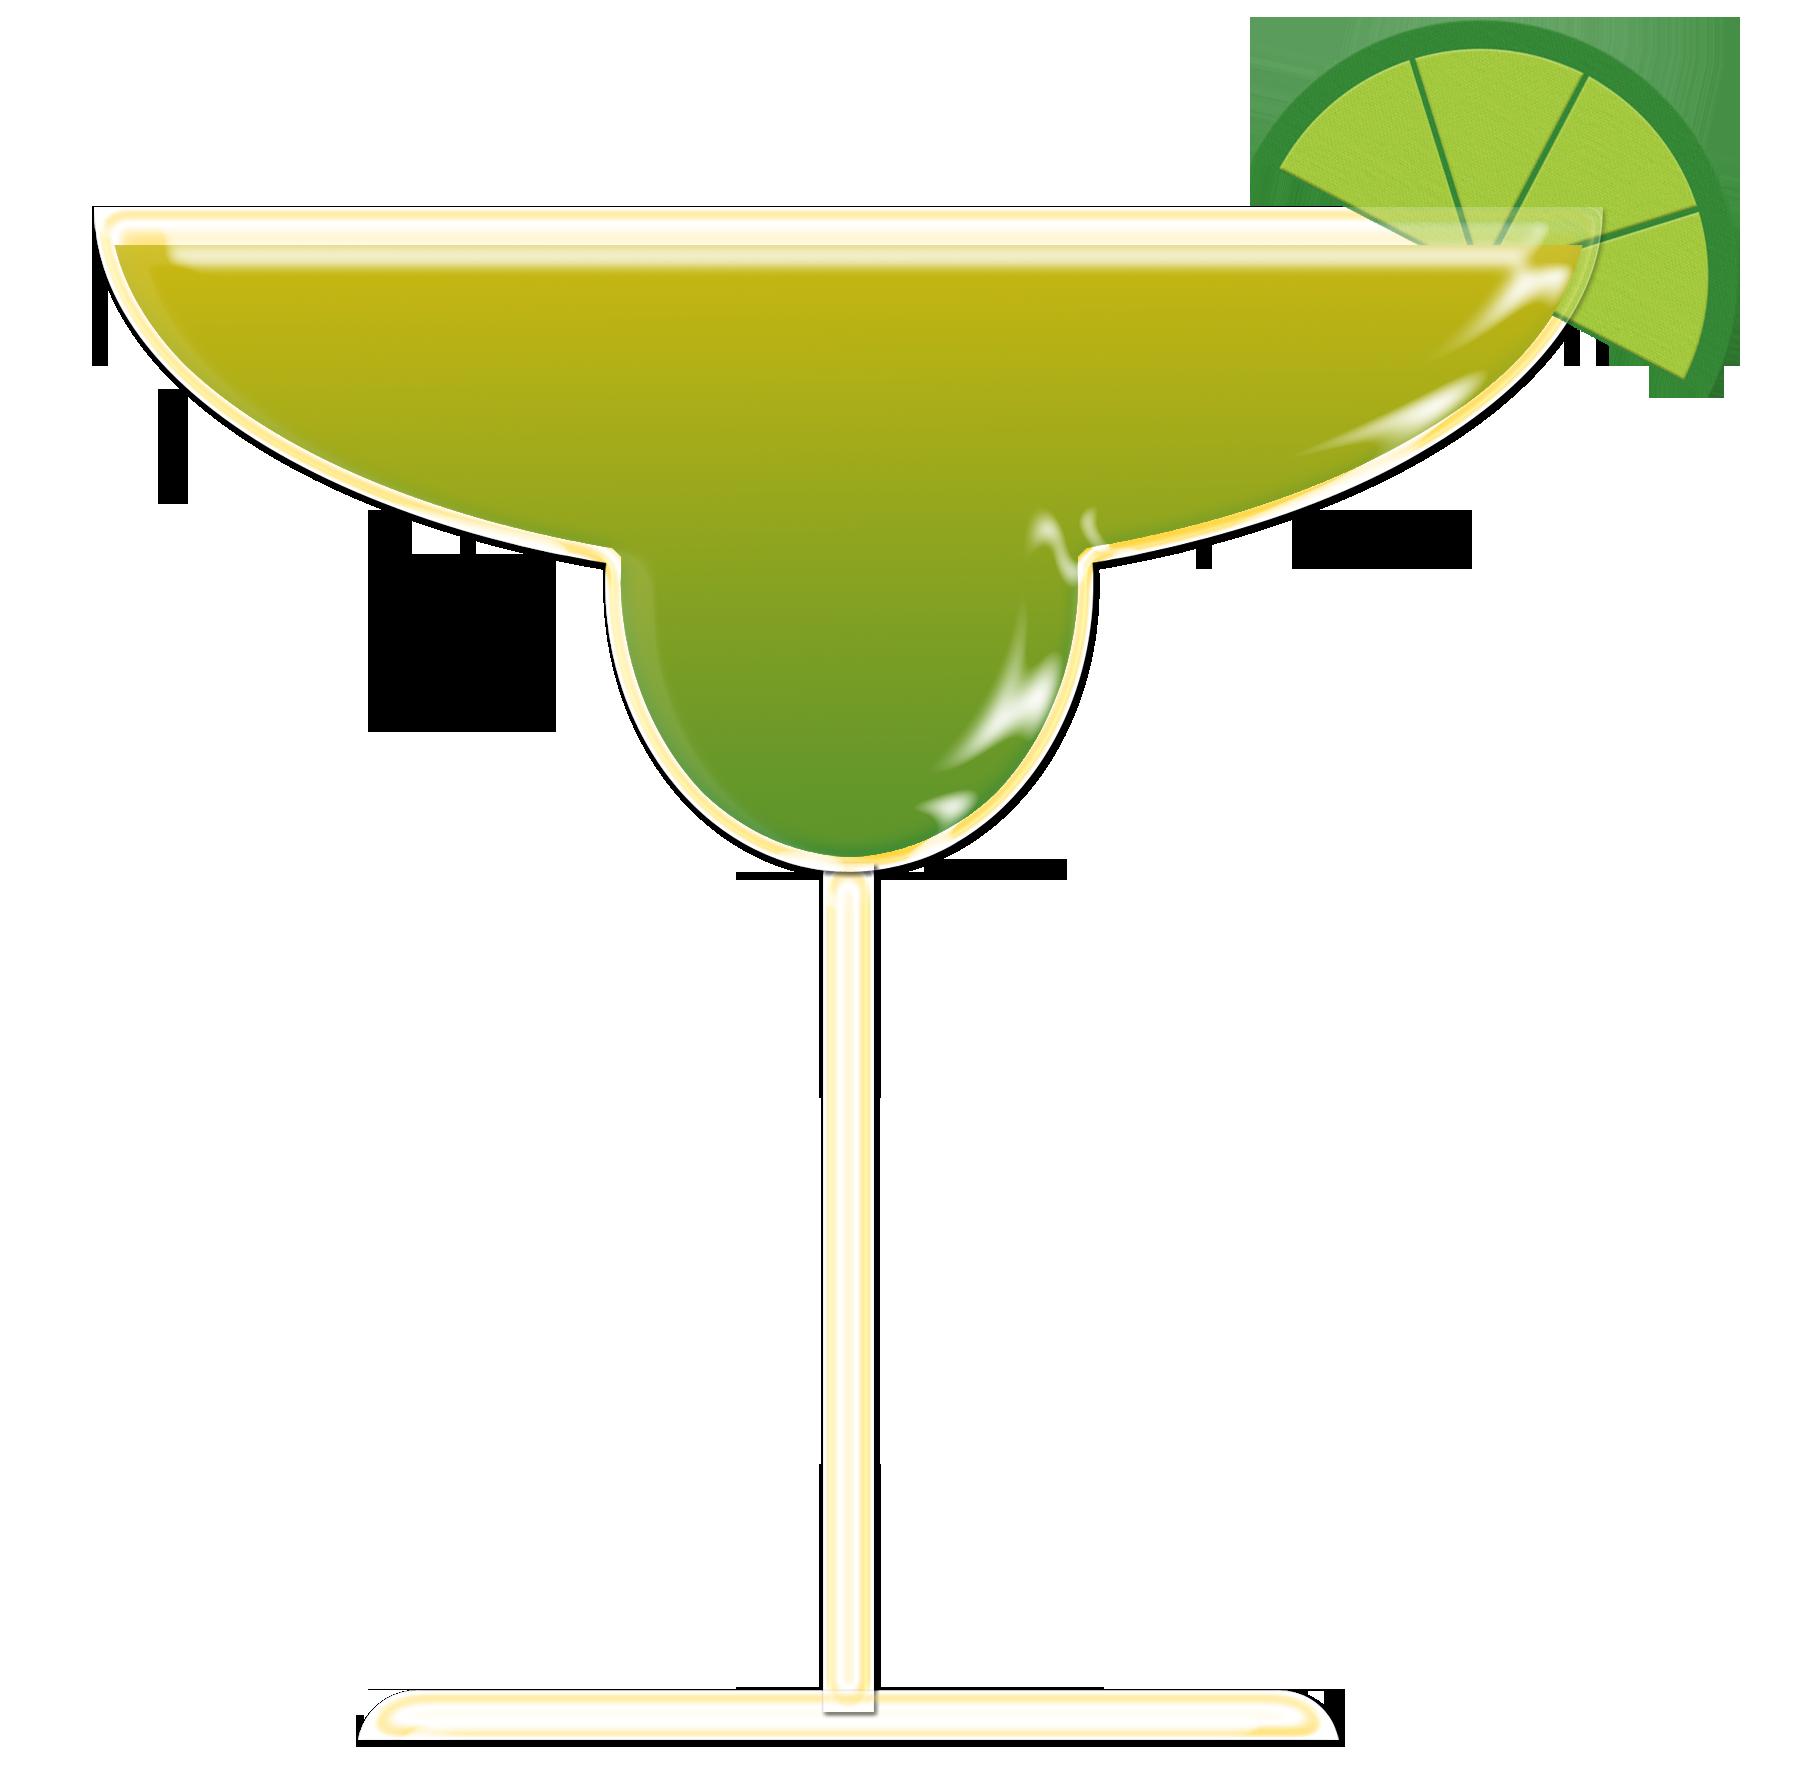 jpg royalty free download Margarita clipart birthday. Glass drawing at getdrawings.